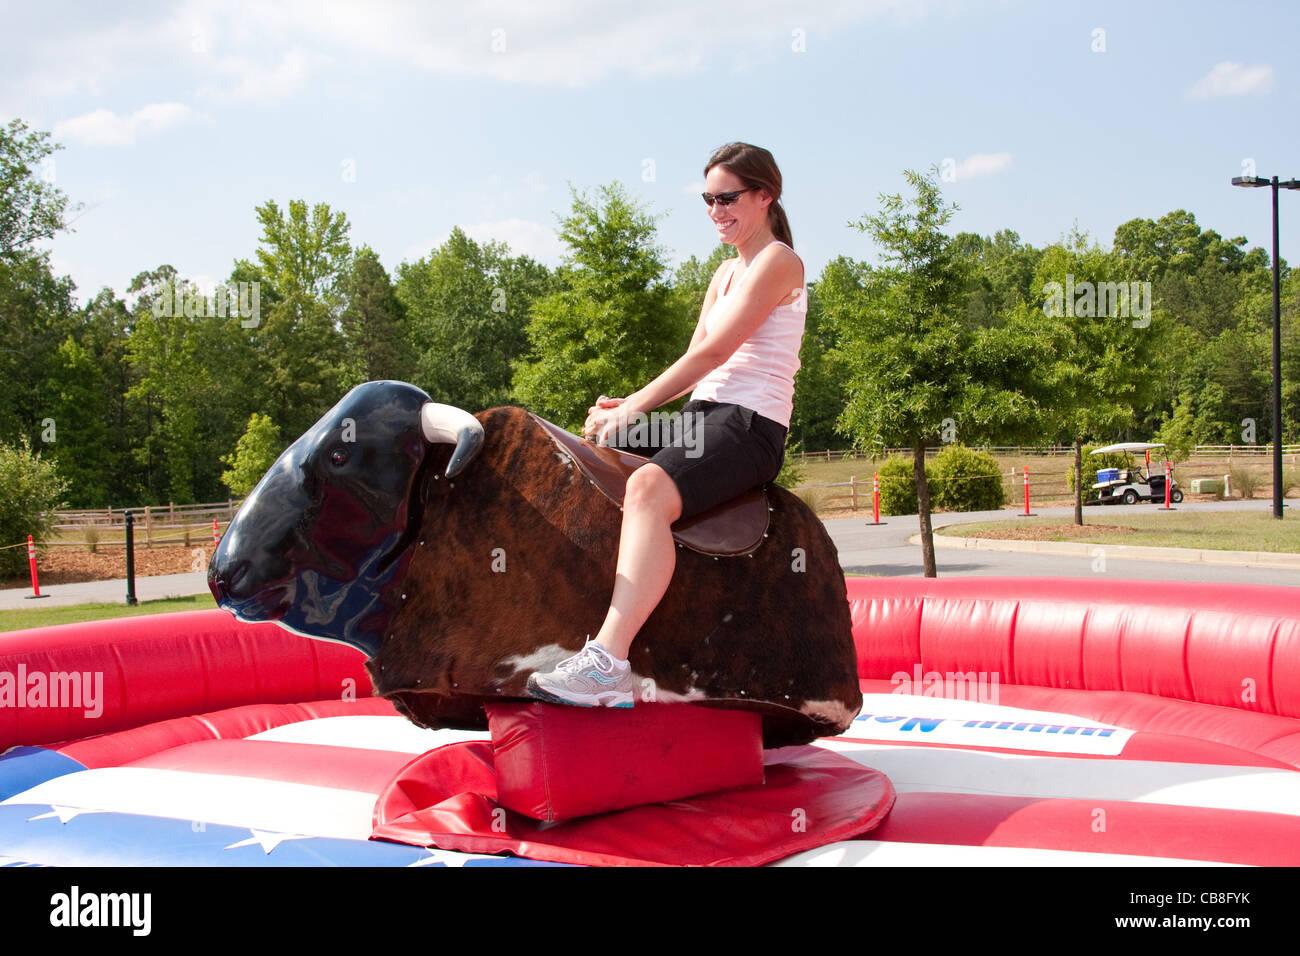 Mechanical Bull Riding In Orlando Fl